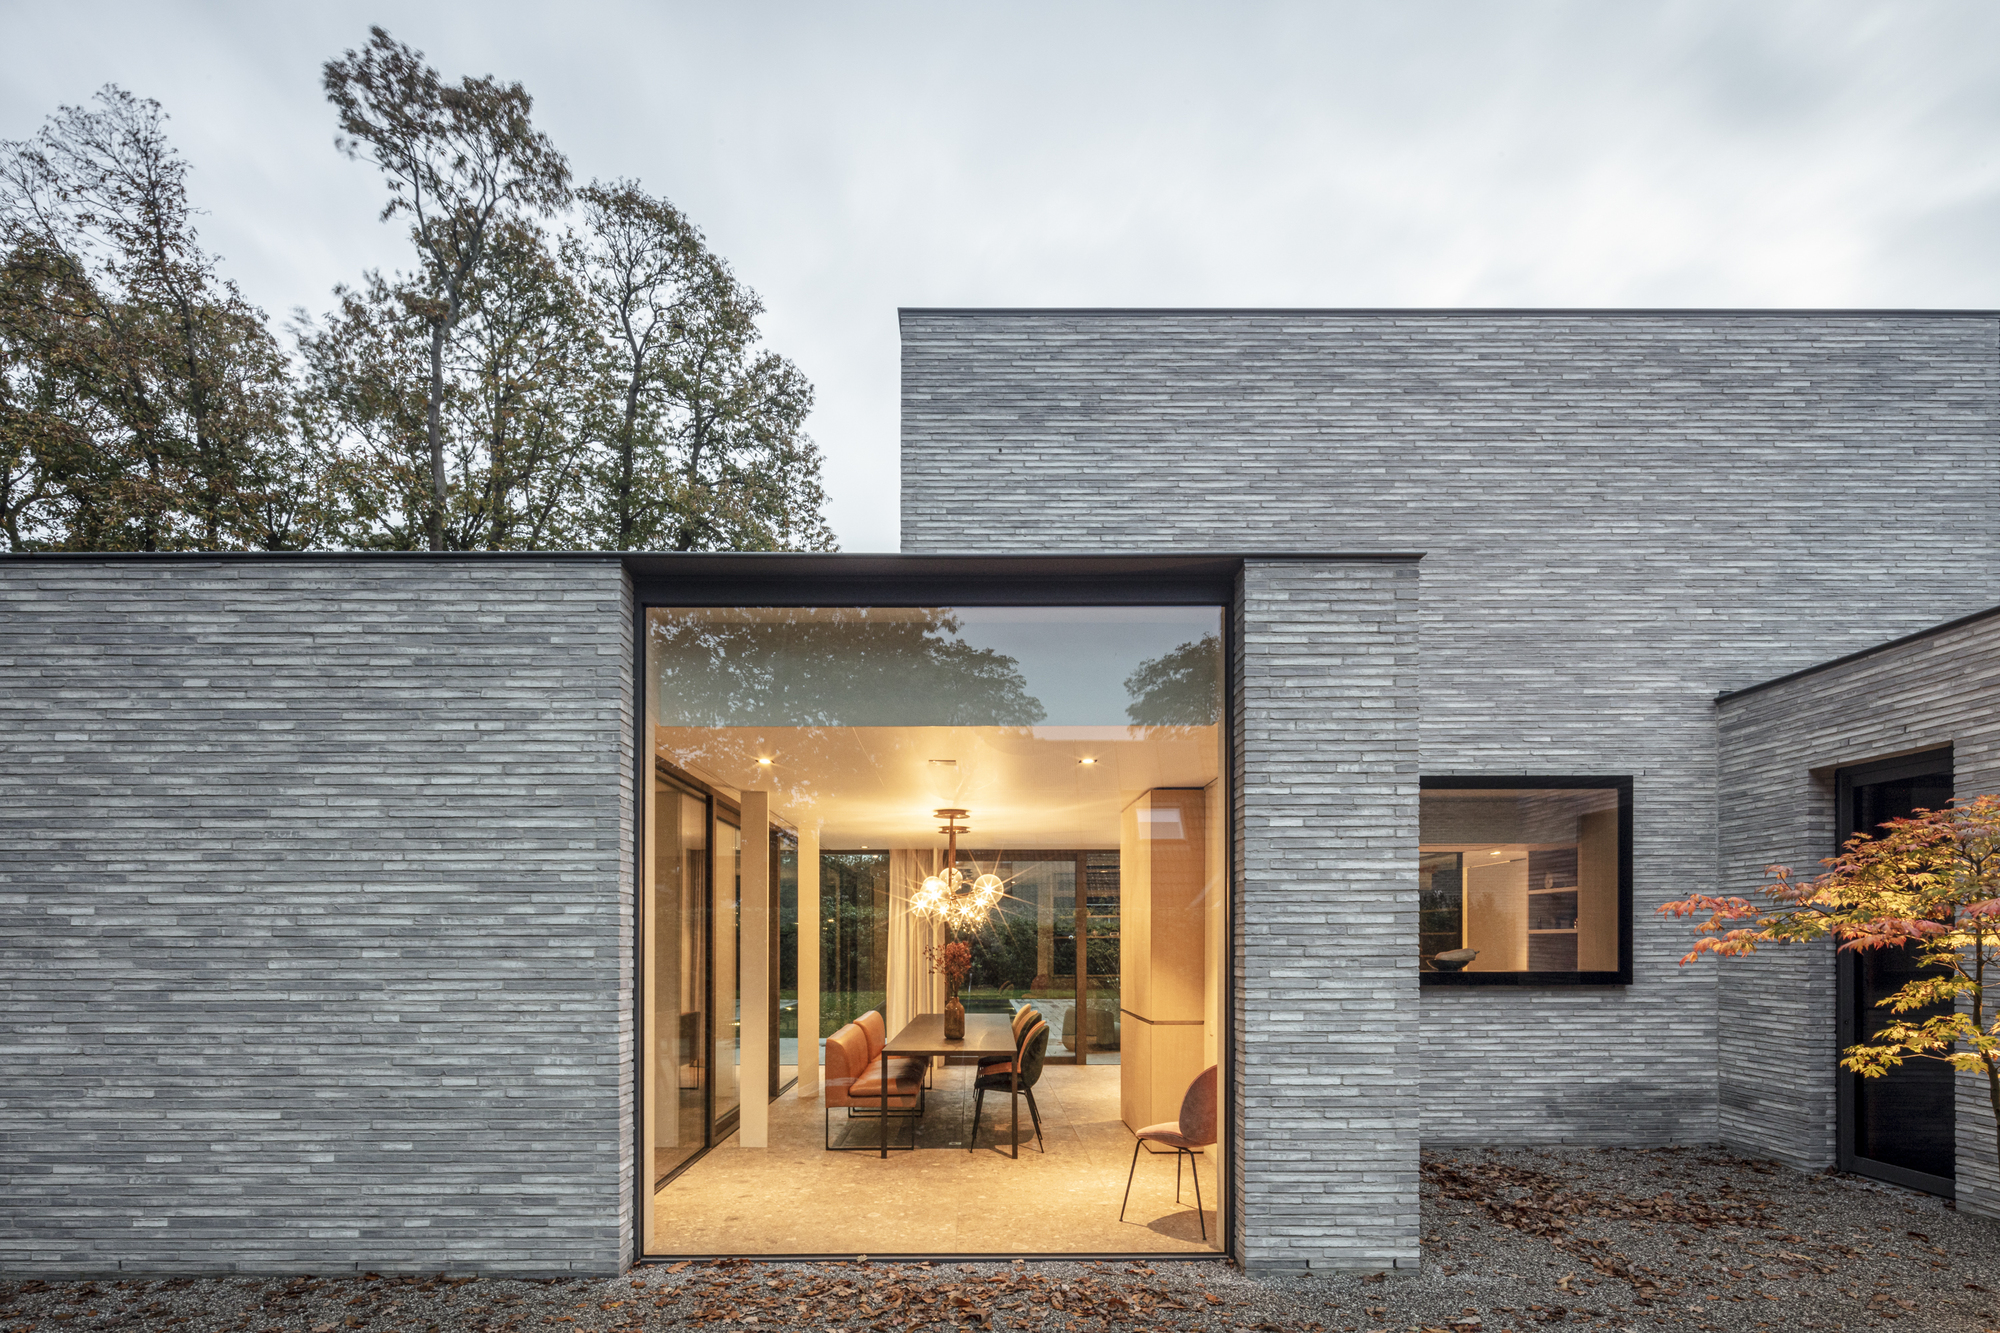 Residence WULF / CAS architecten